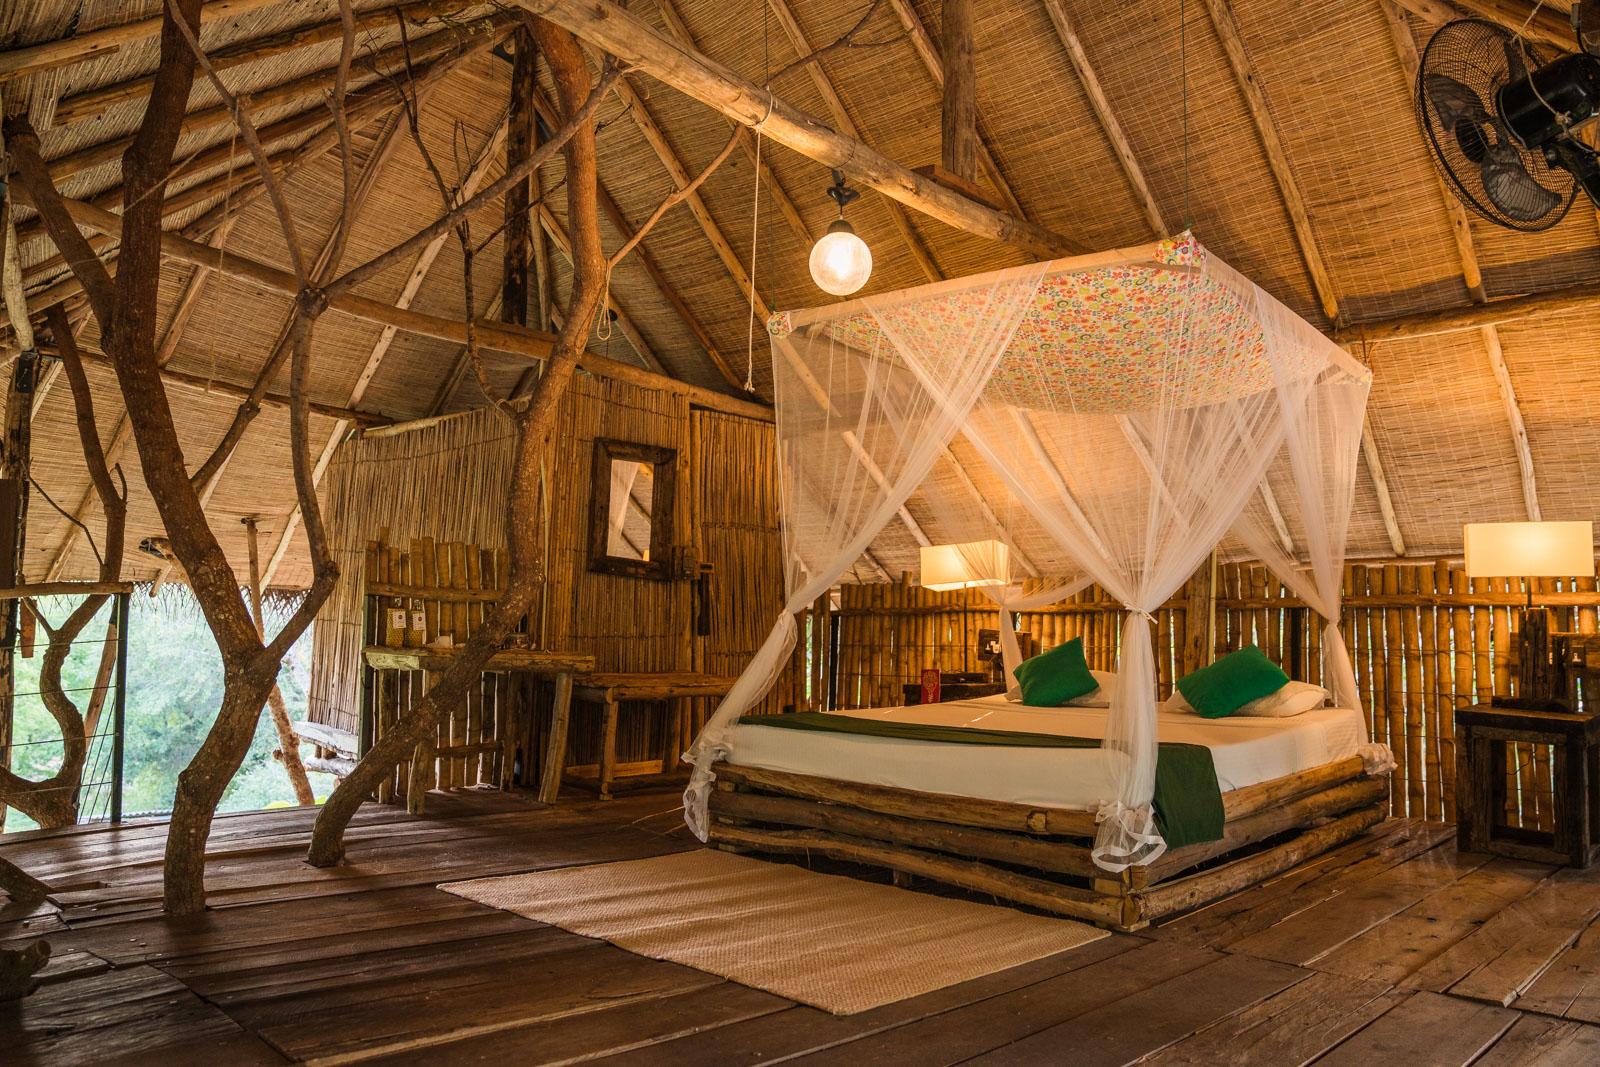 Saraii Village Eco Lodge With Mud Chalets Amp Tree Houses